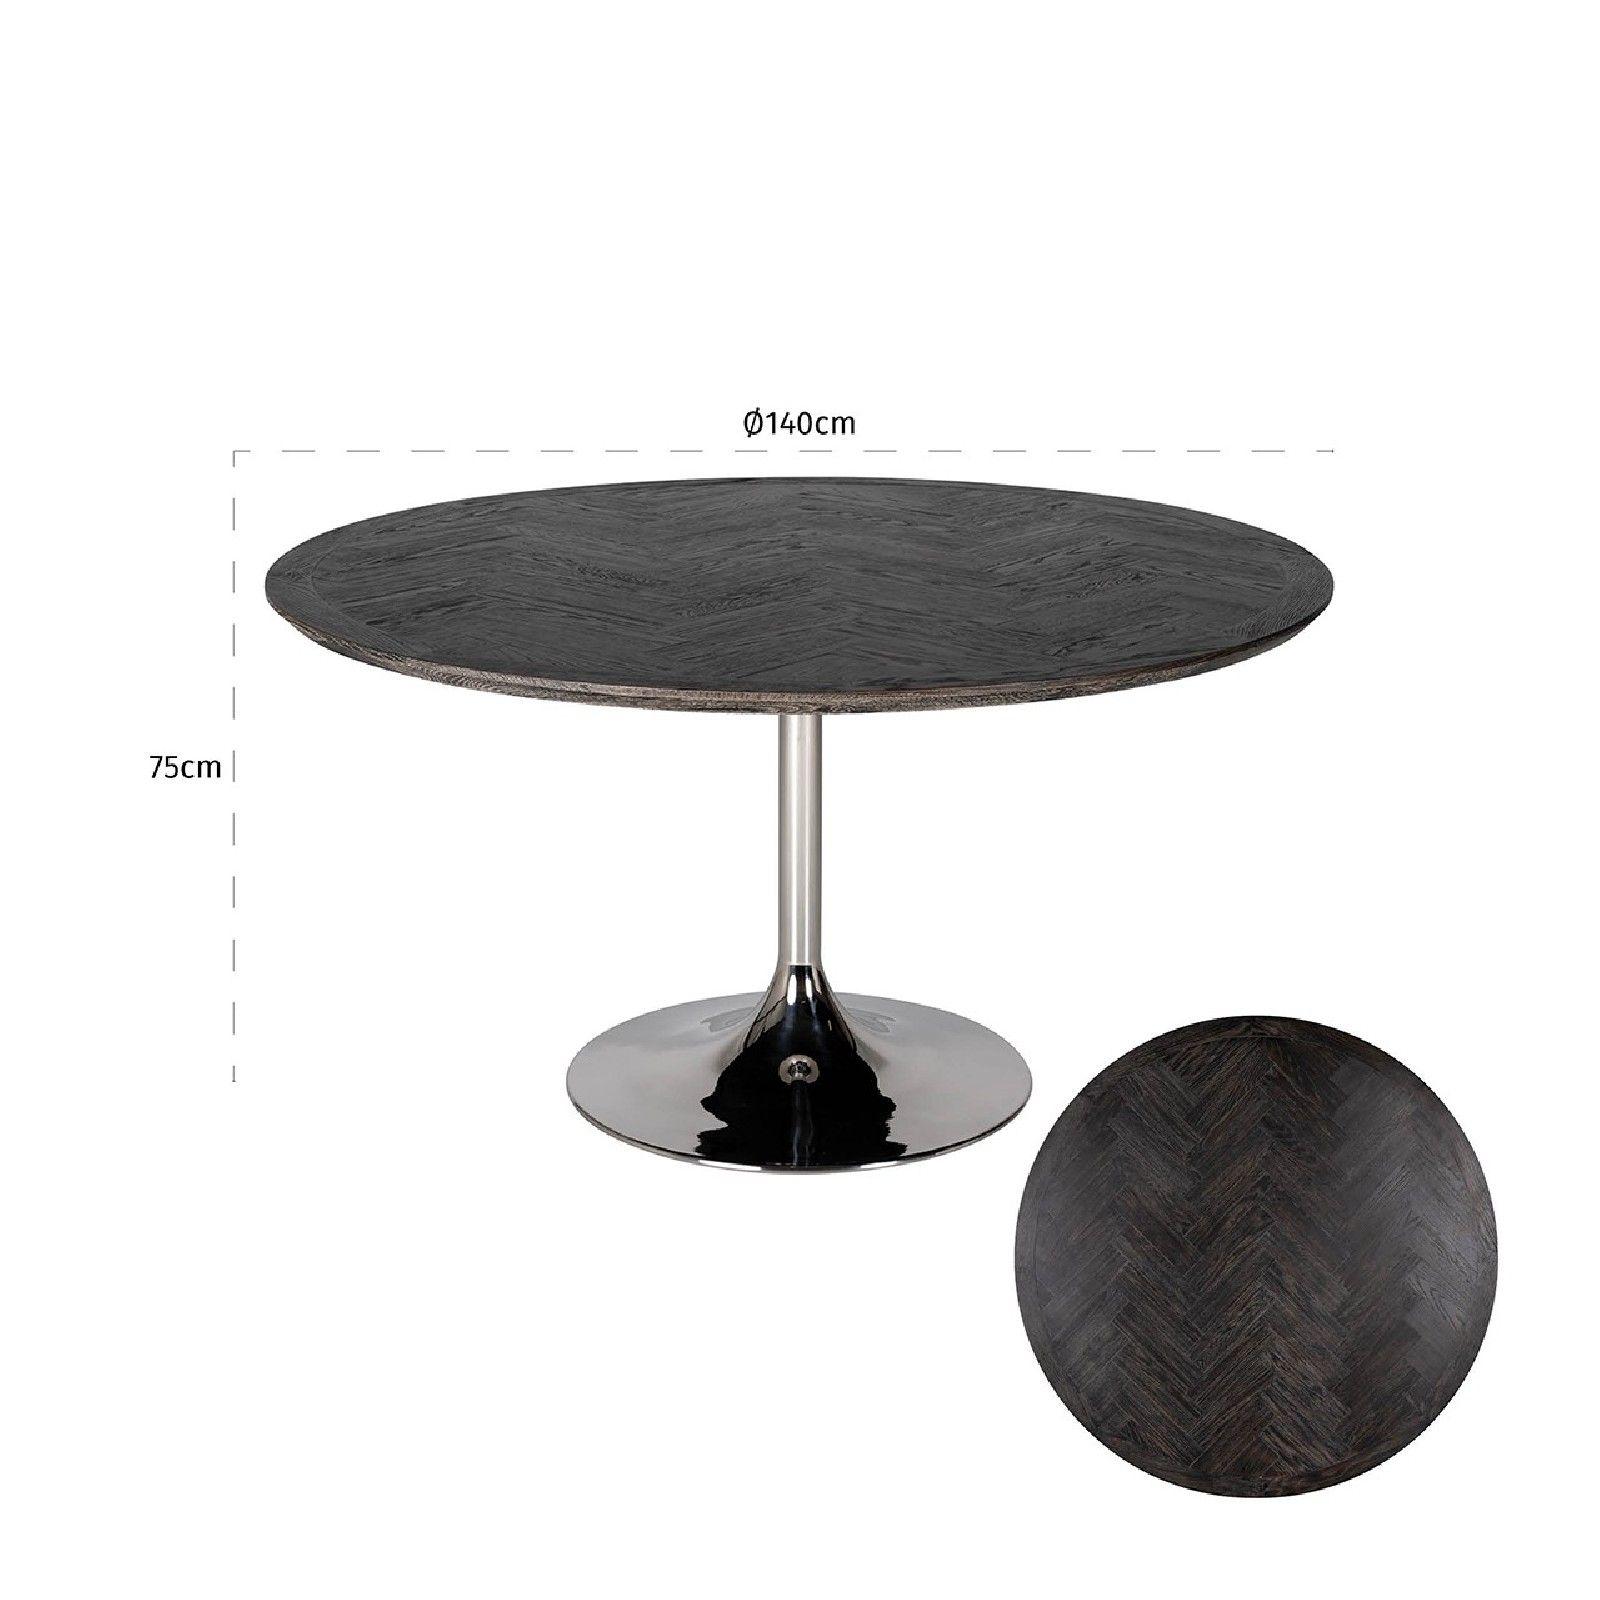 Table à dîner Blackbone Ø140 argentée Meuble Déco Tendance - 3